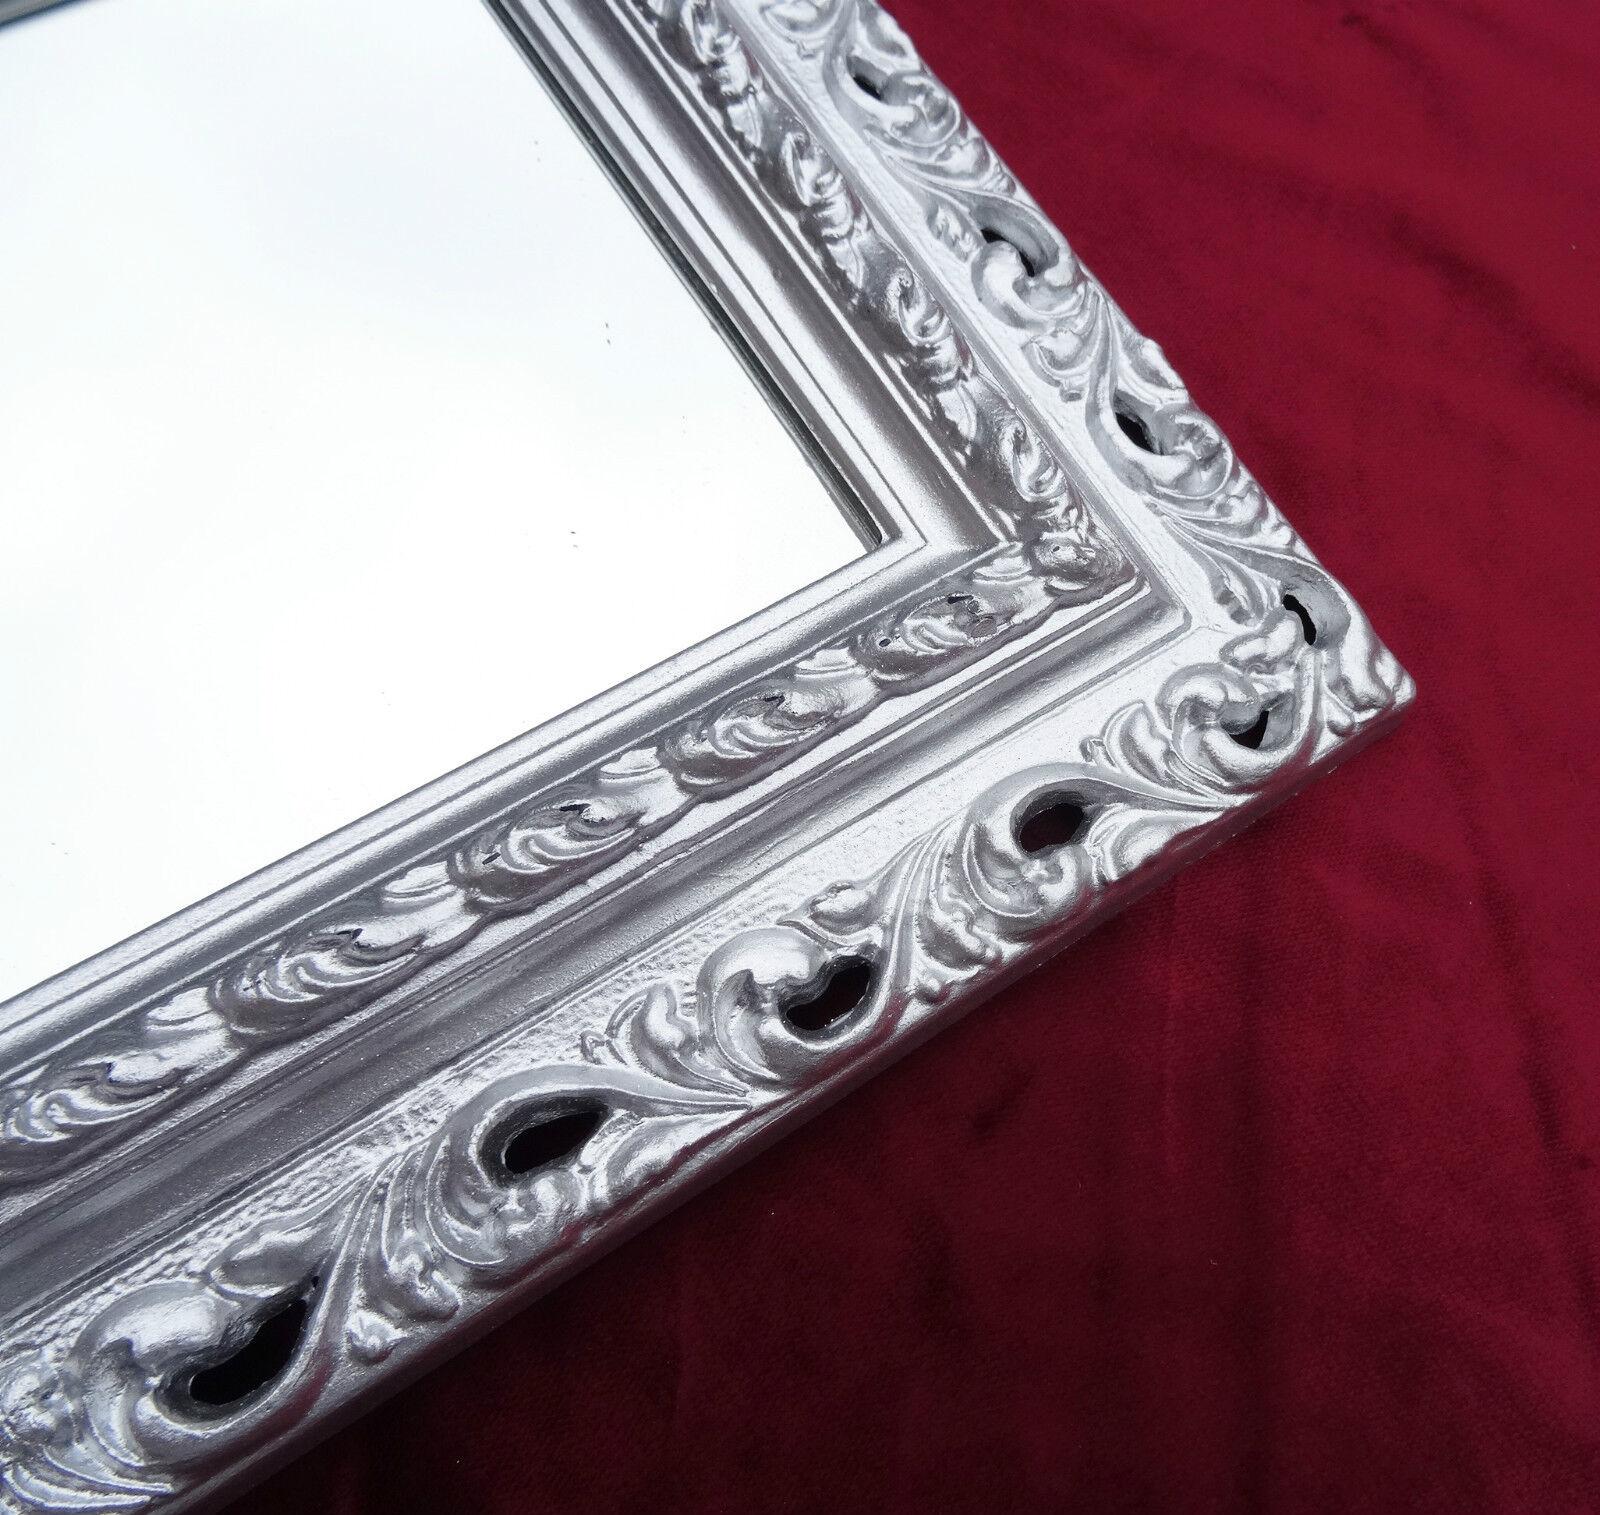 wandspiegel 43x36 spiegel barock rechteckig repro silber bilderrahmen arabesco 2 ebay. Black Bedroom Furniture Sets. Home Design Ideas